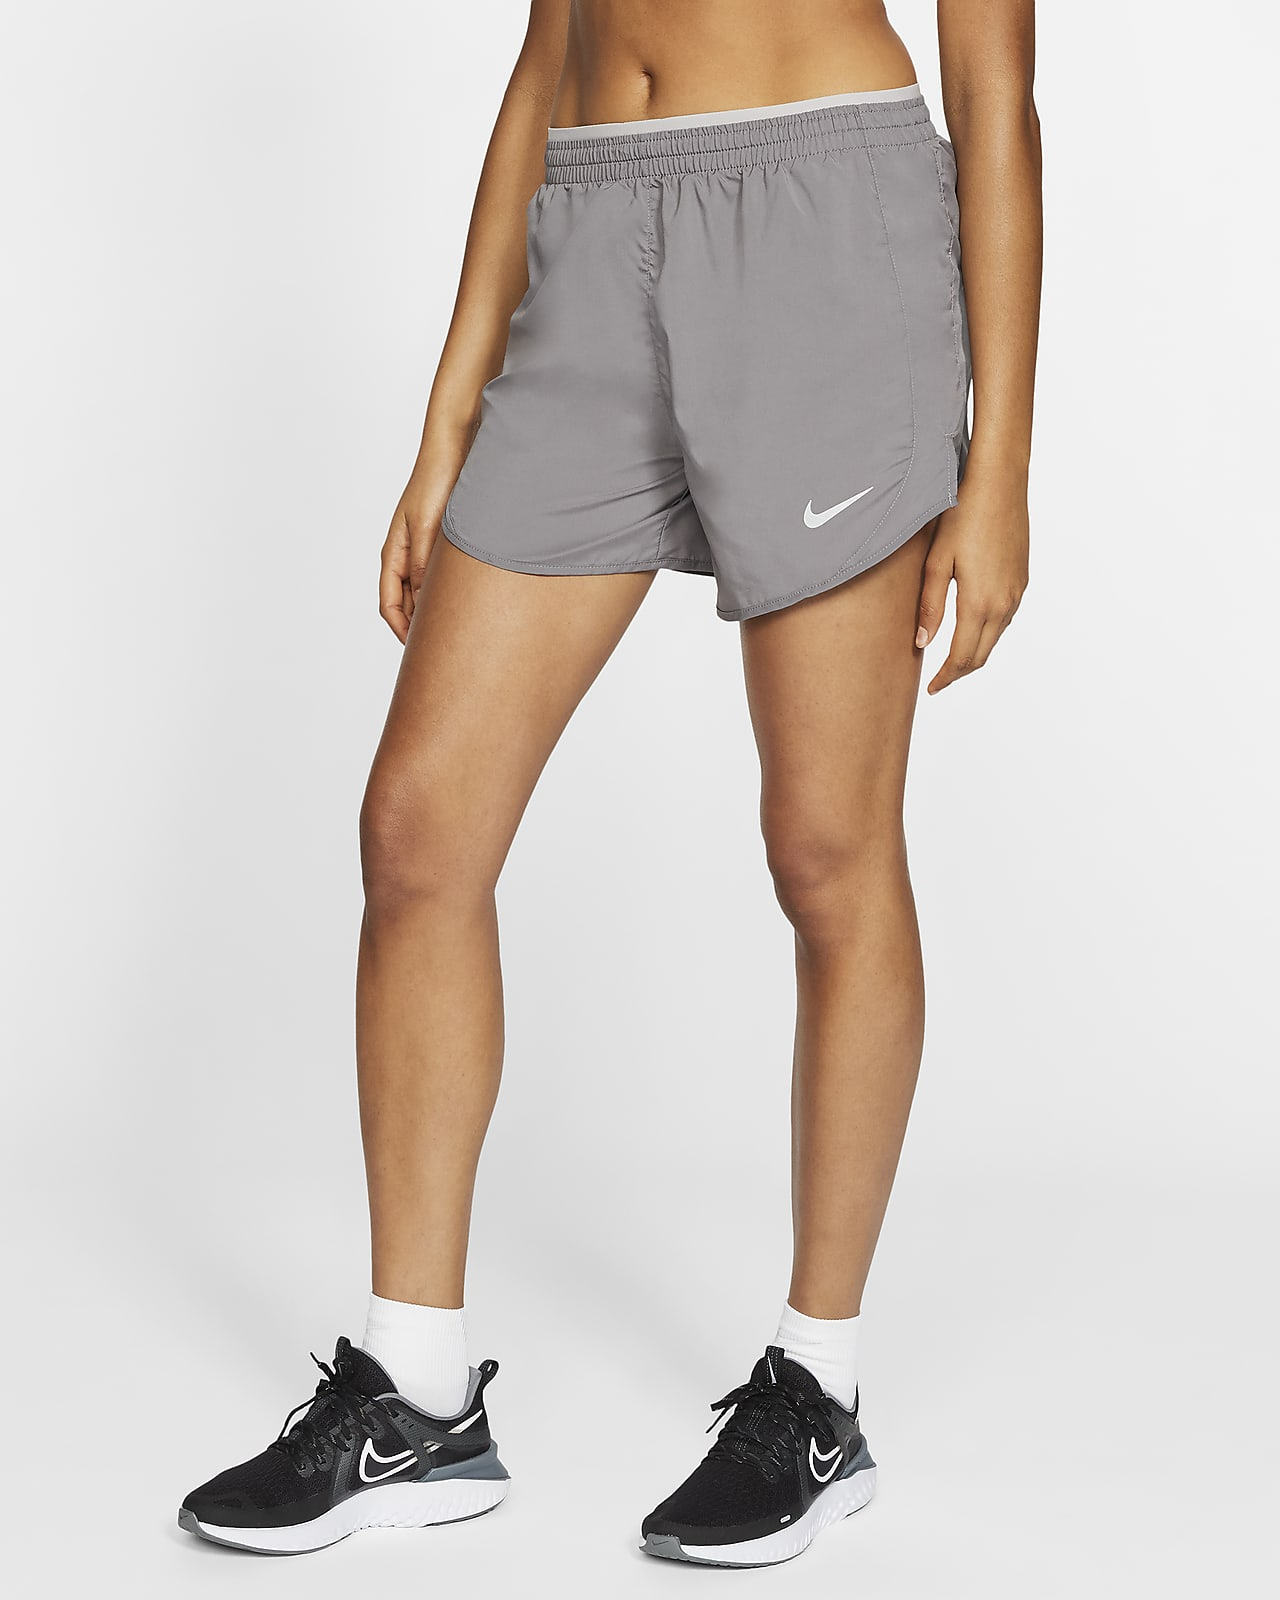 Nike Tempo Luxe Women's Running Shorts